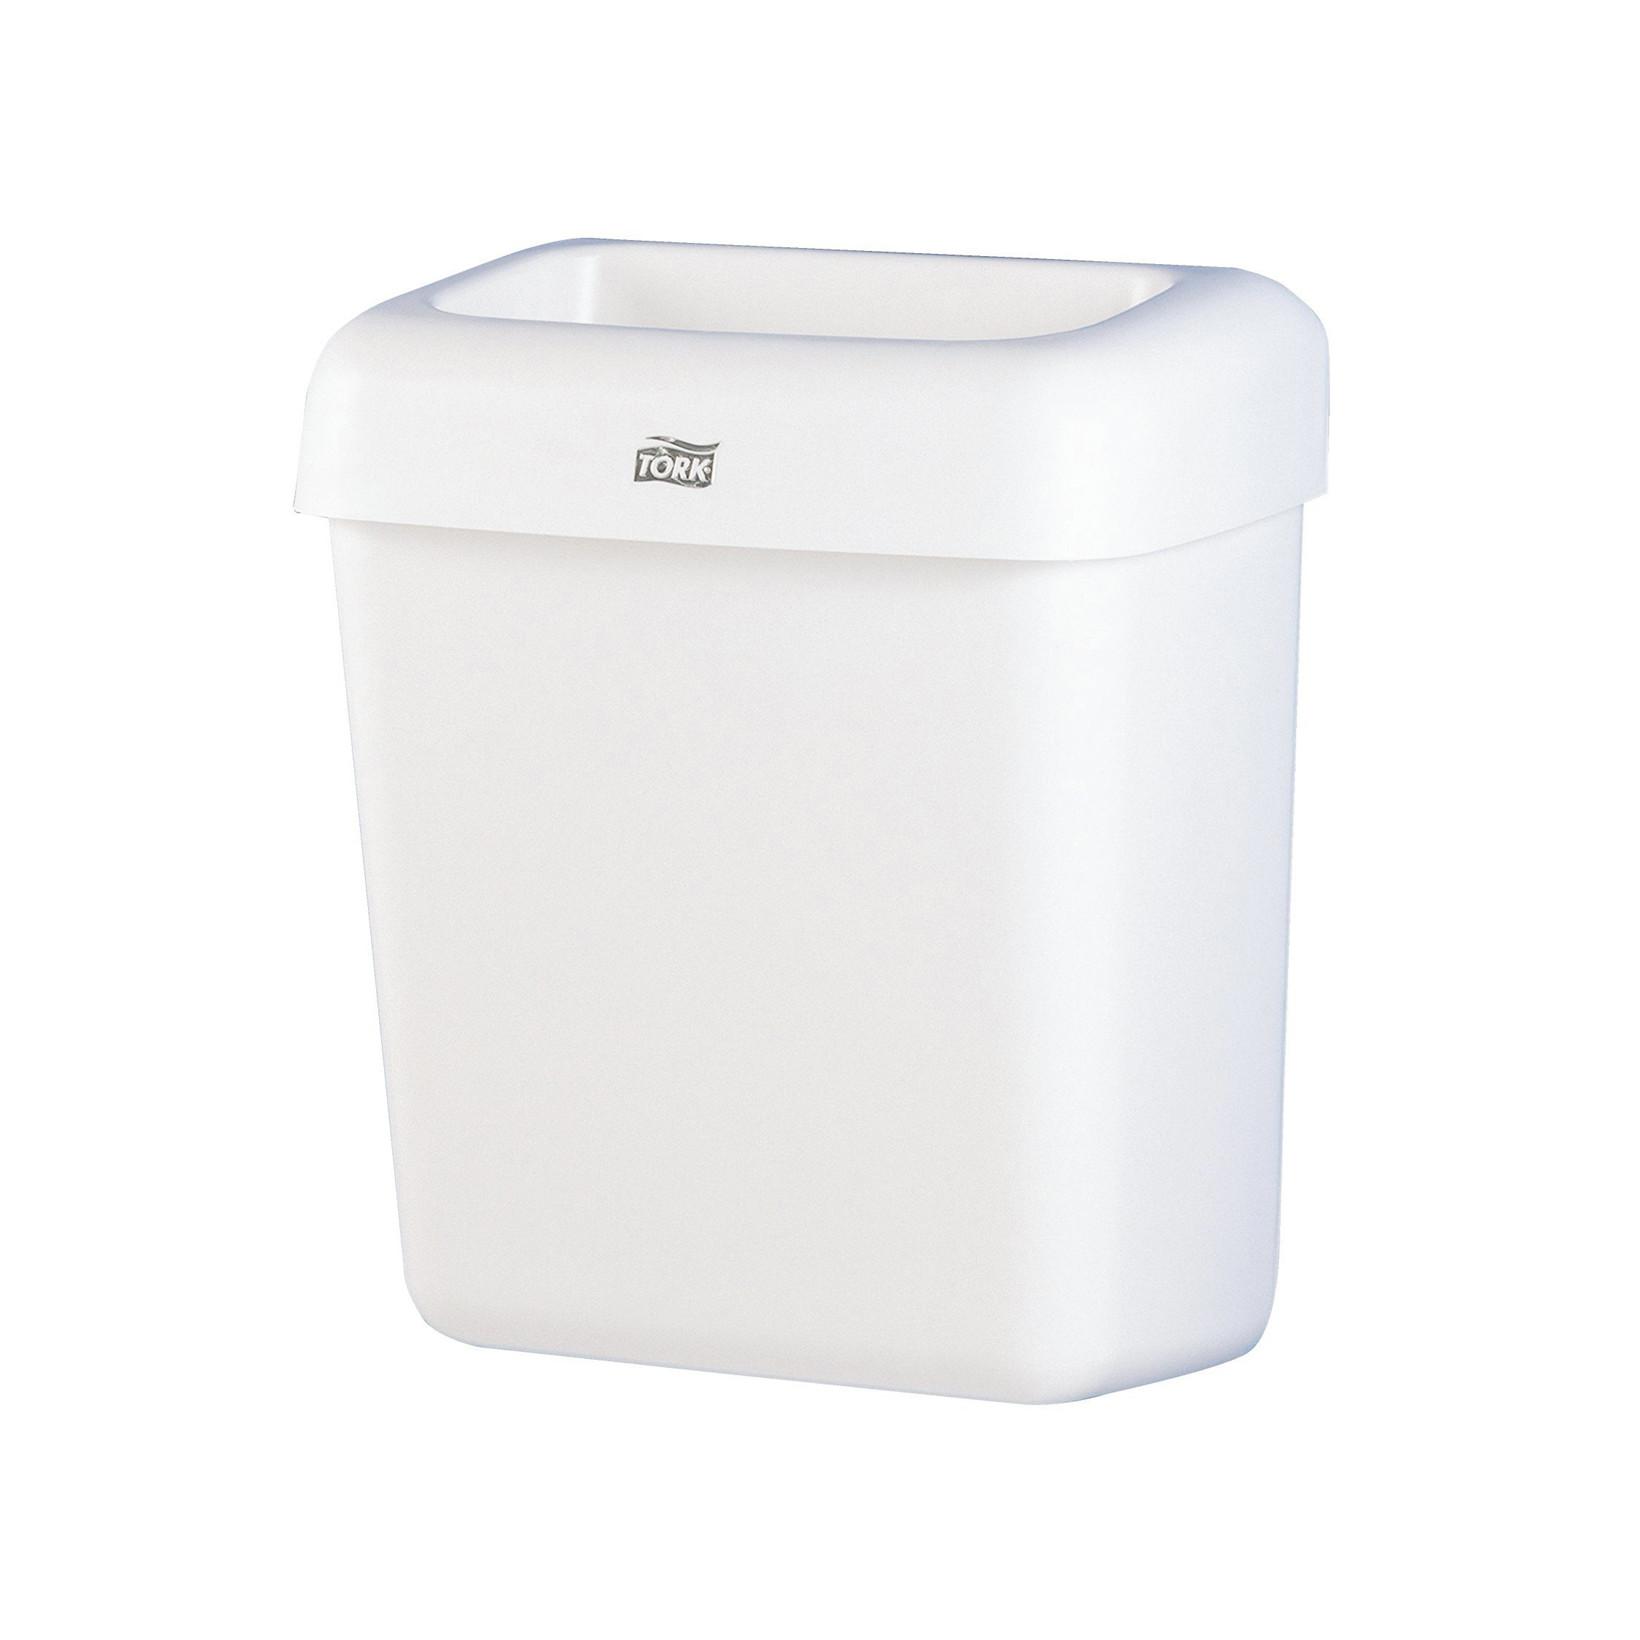 Tork affaldskurv 20 liter B2 plast 226100 - hvid